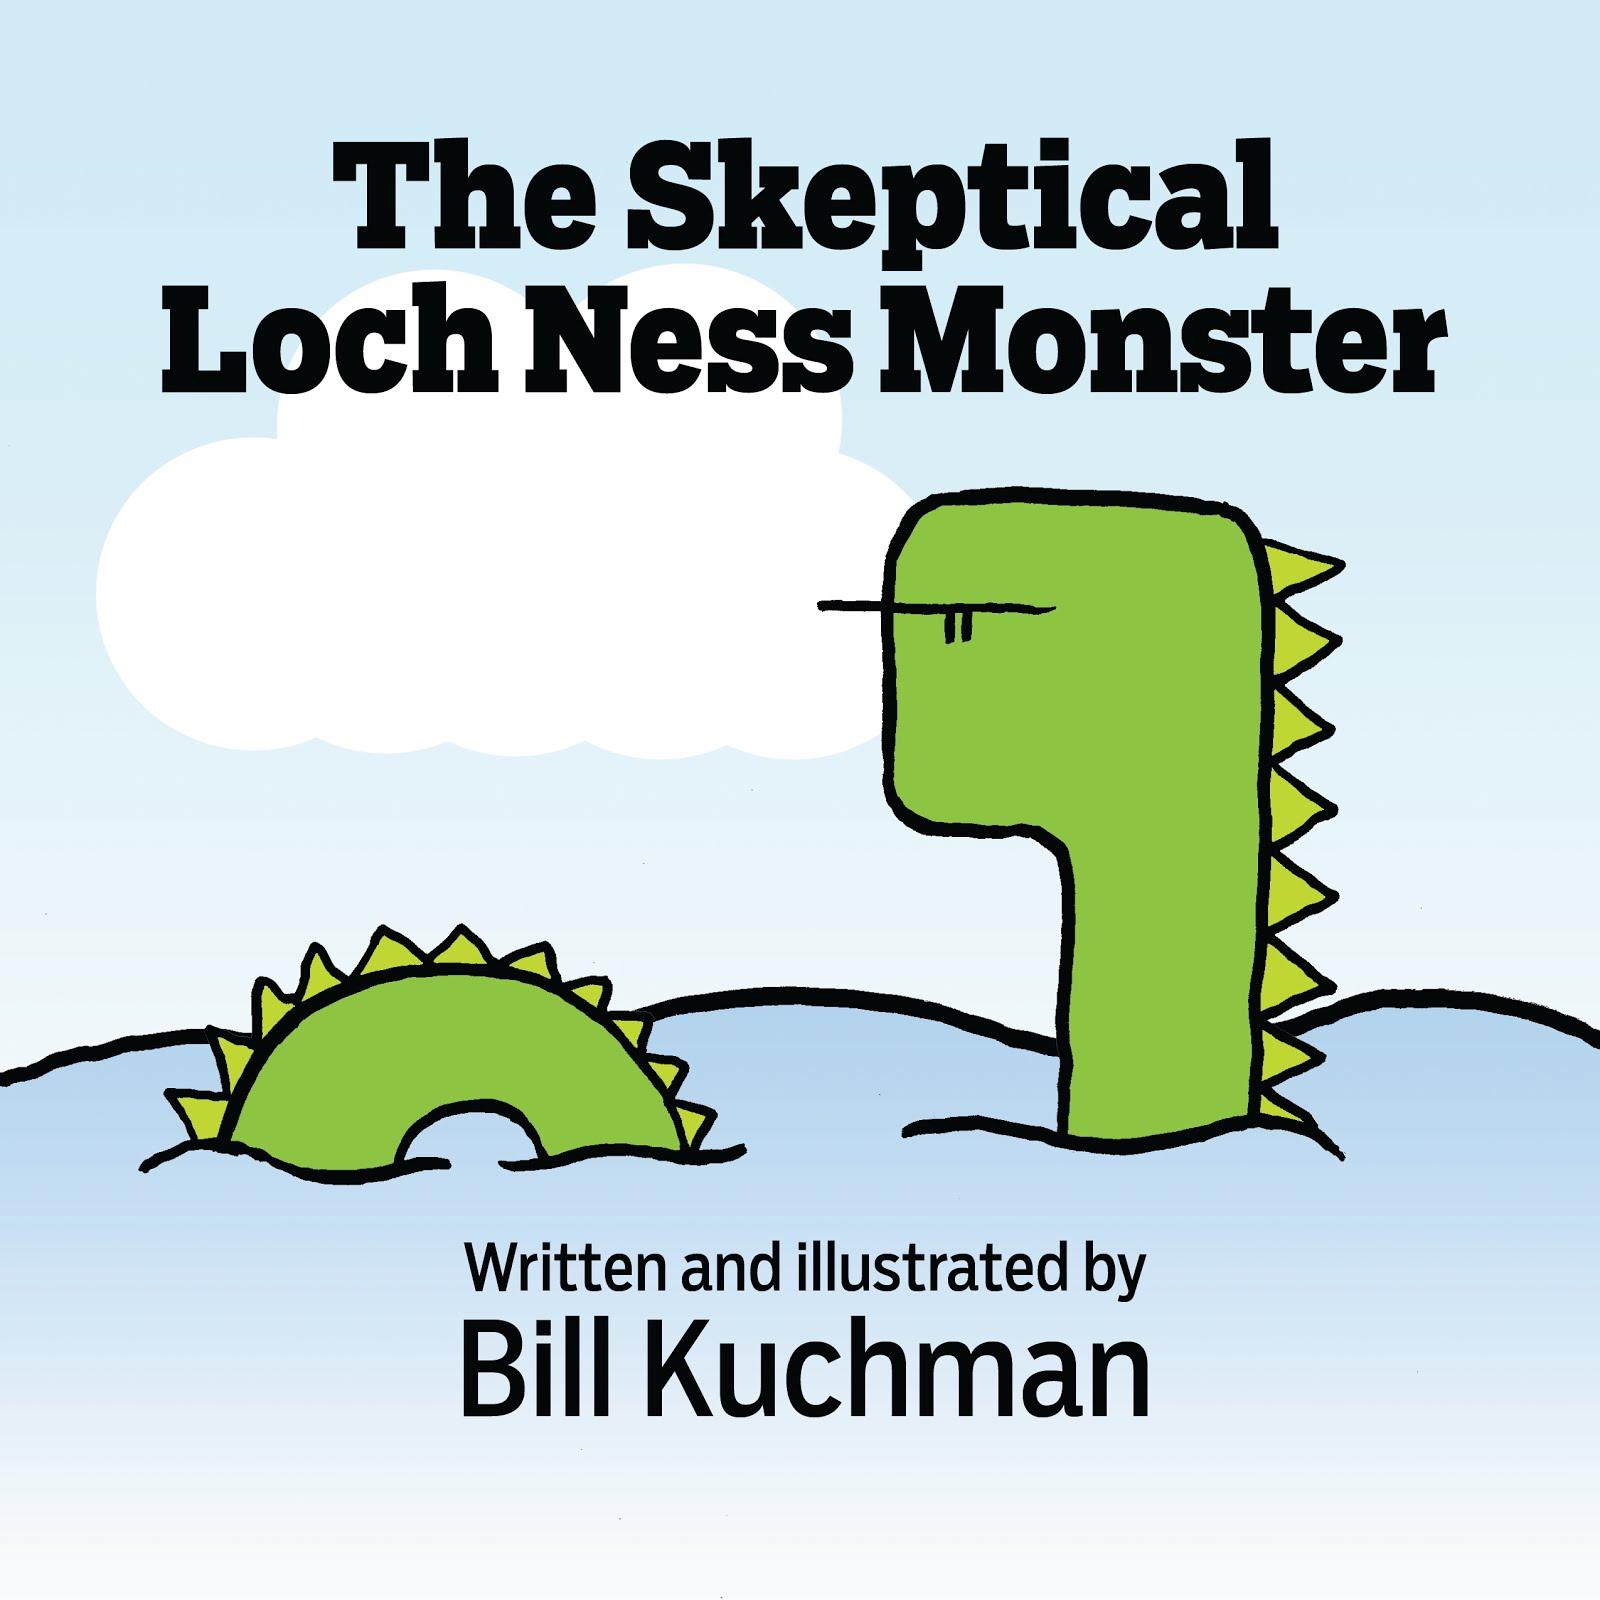 The Skeptical Loch Ness Monster